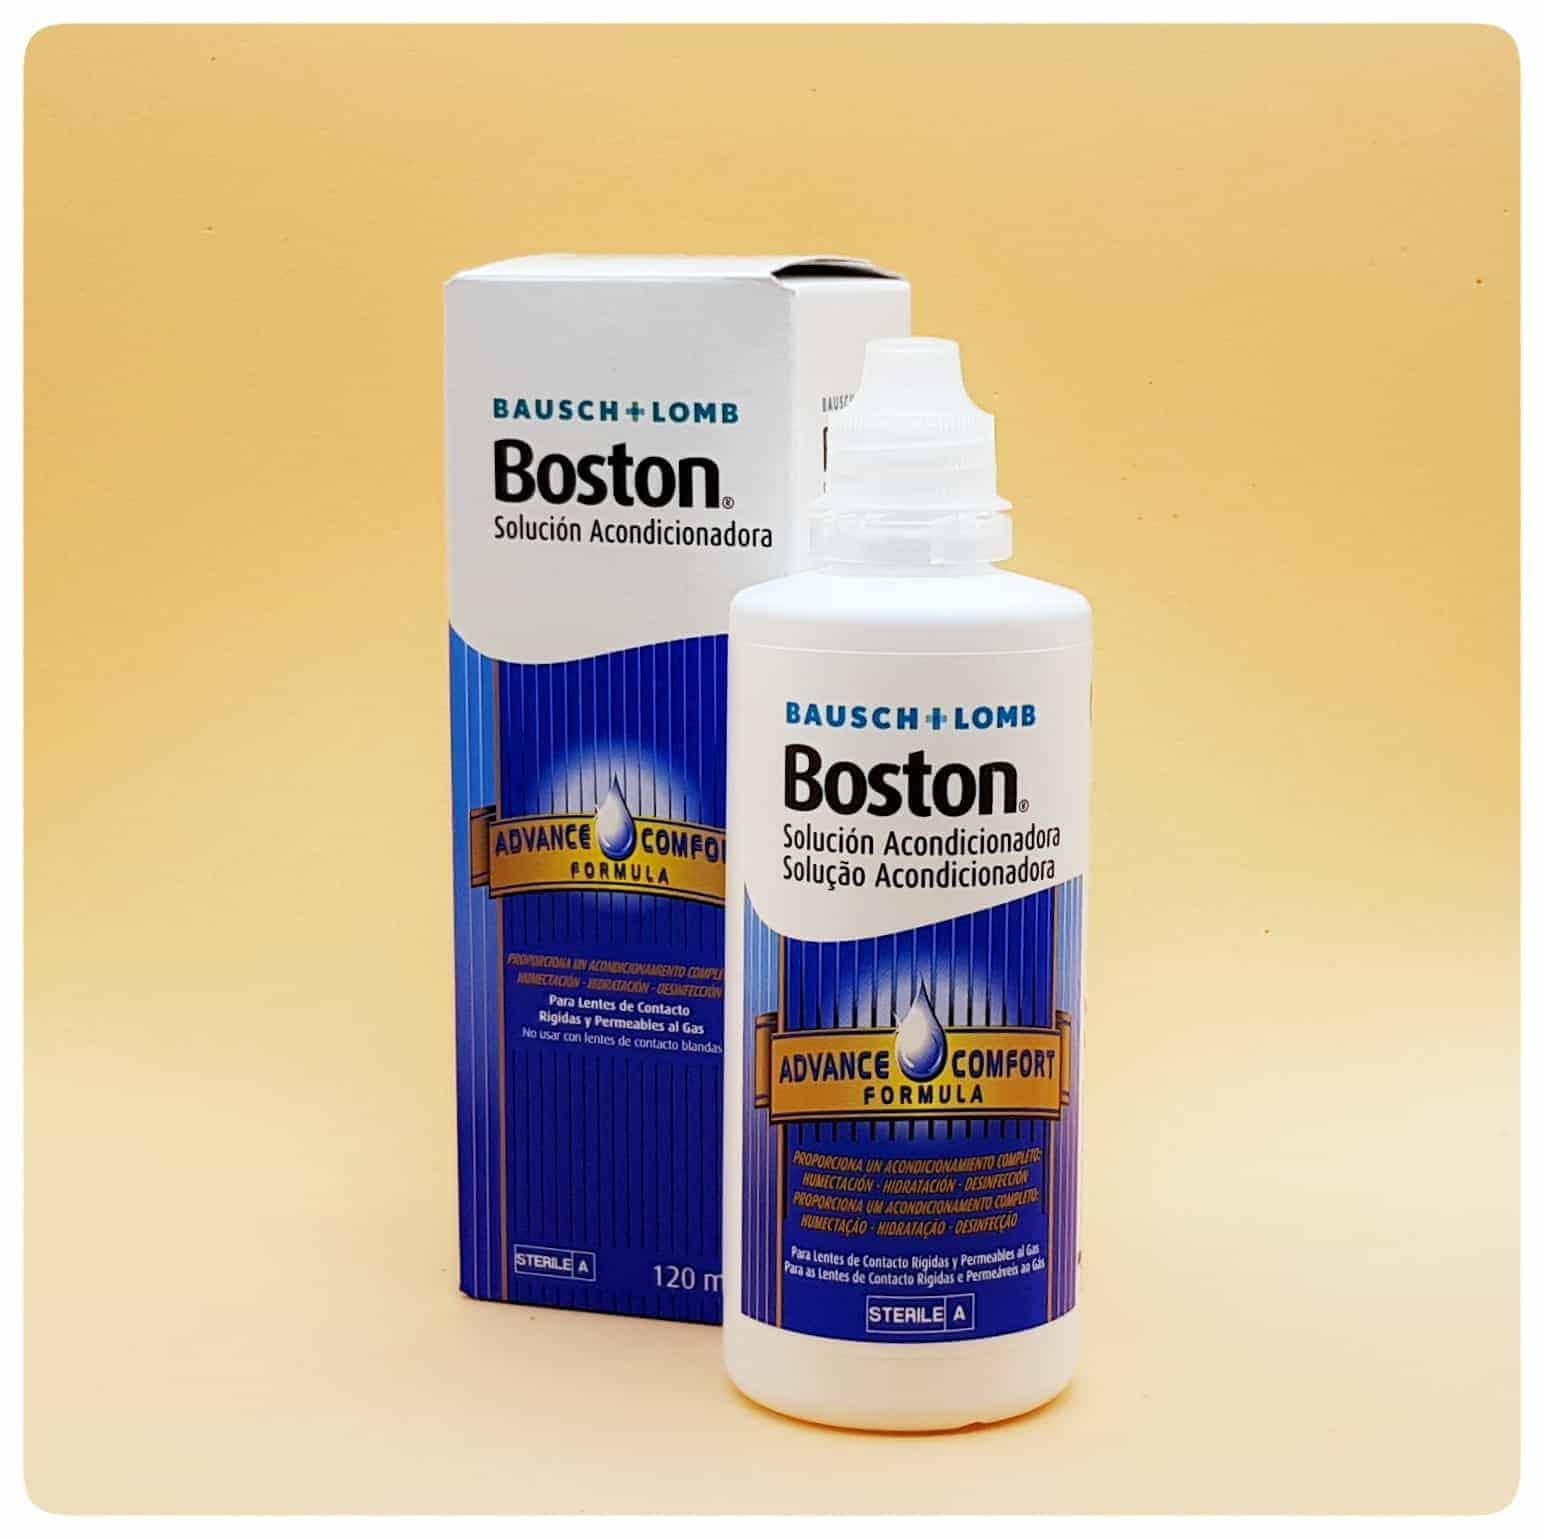 Boston Advance Acondicionador 120ml